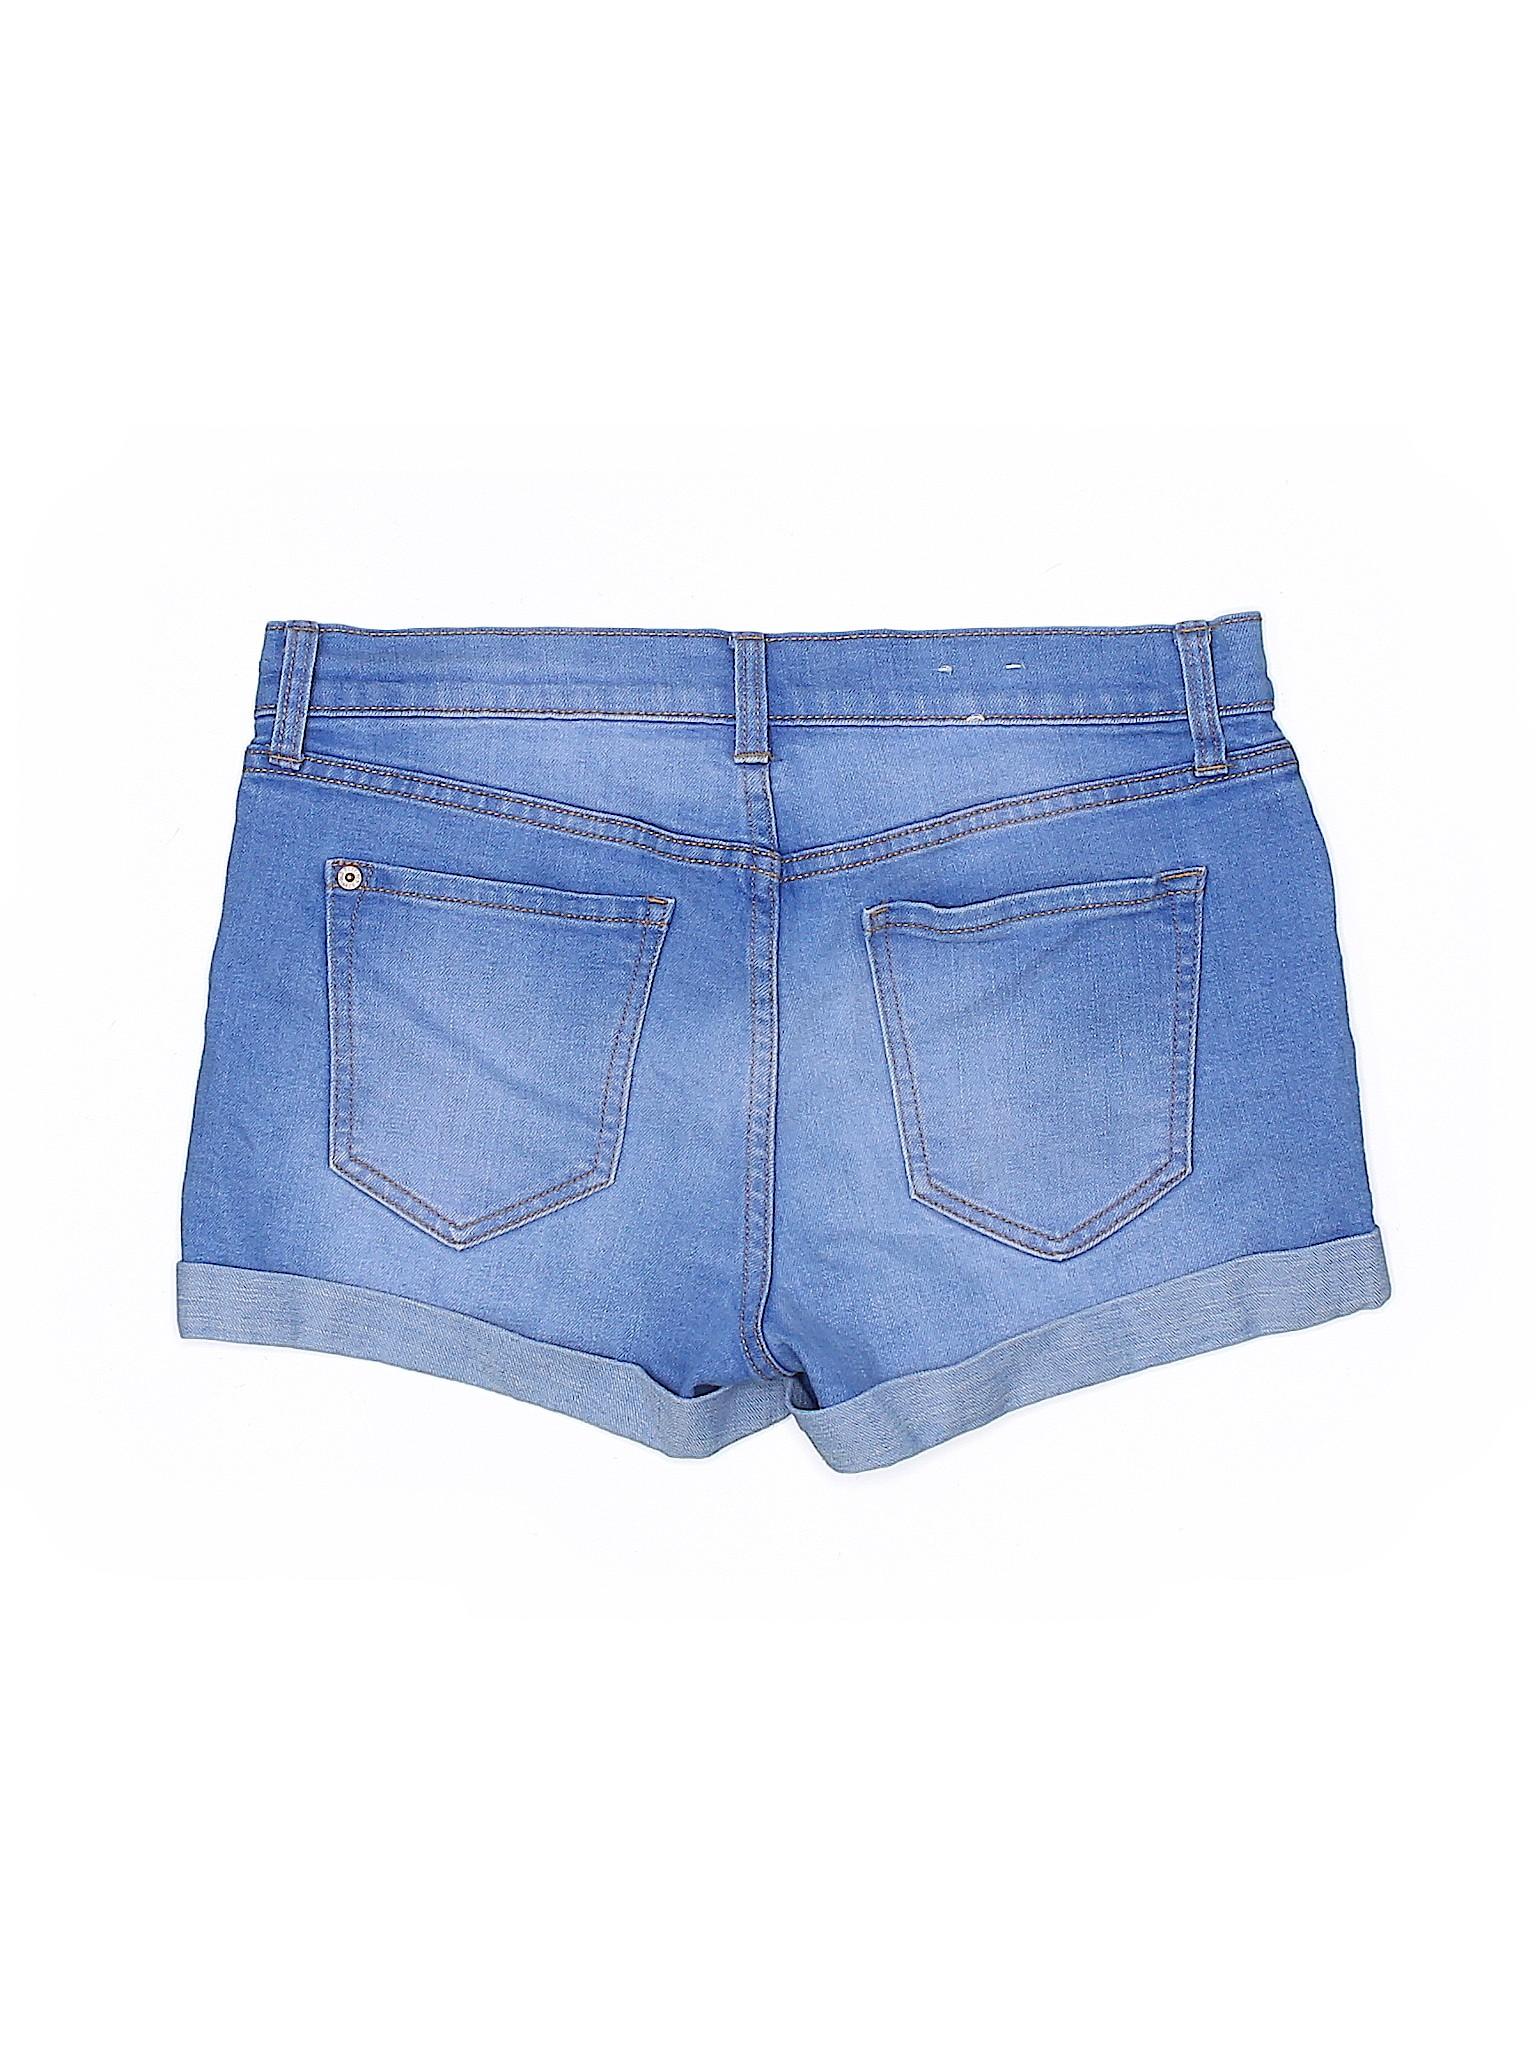 Denim Old Shorts leisure Navy Boutique 5tgqx